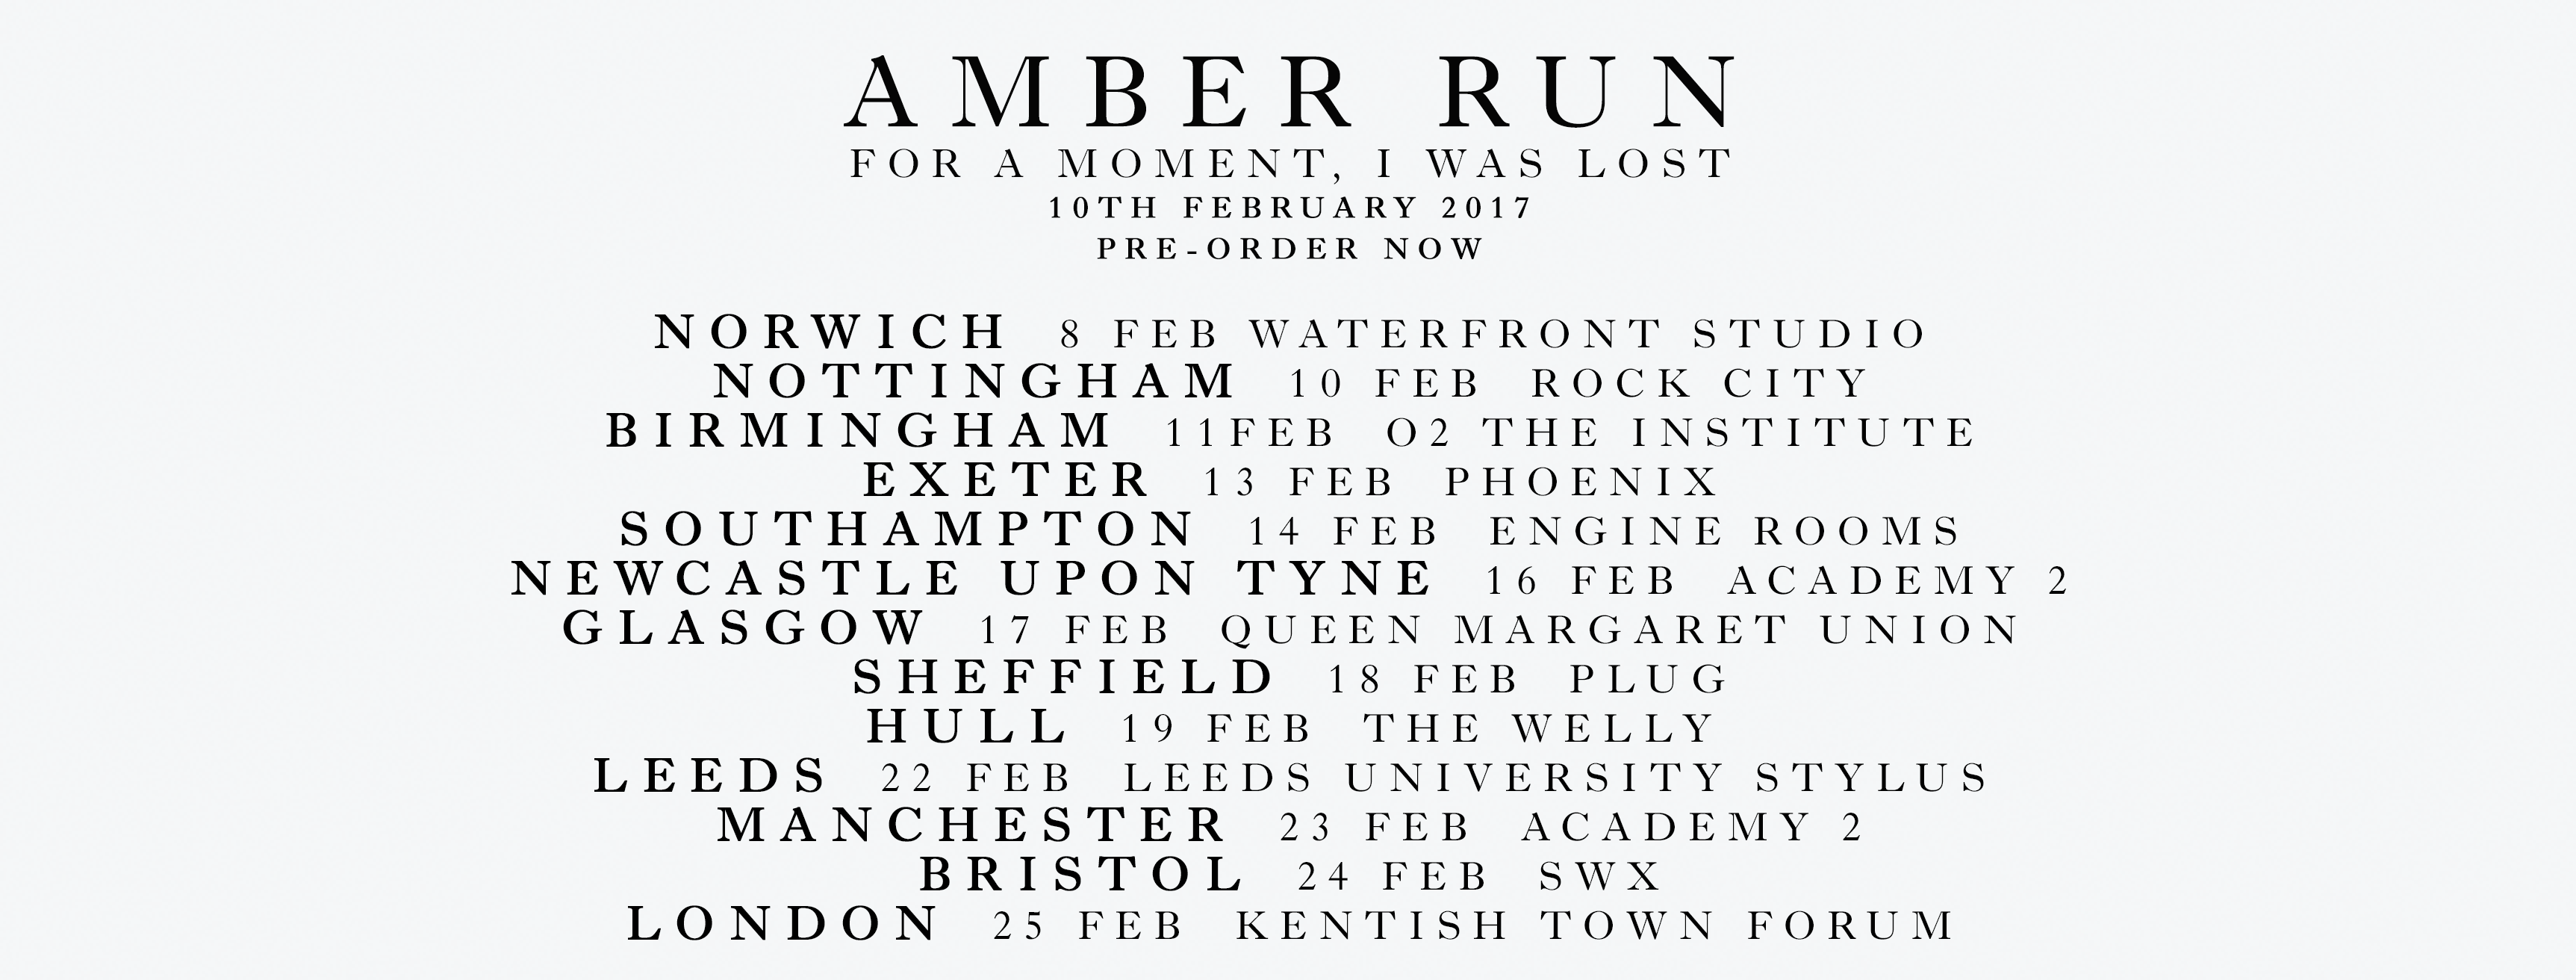 Amber Run Tour 2017